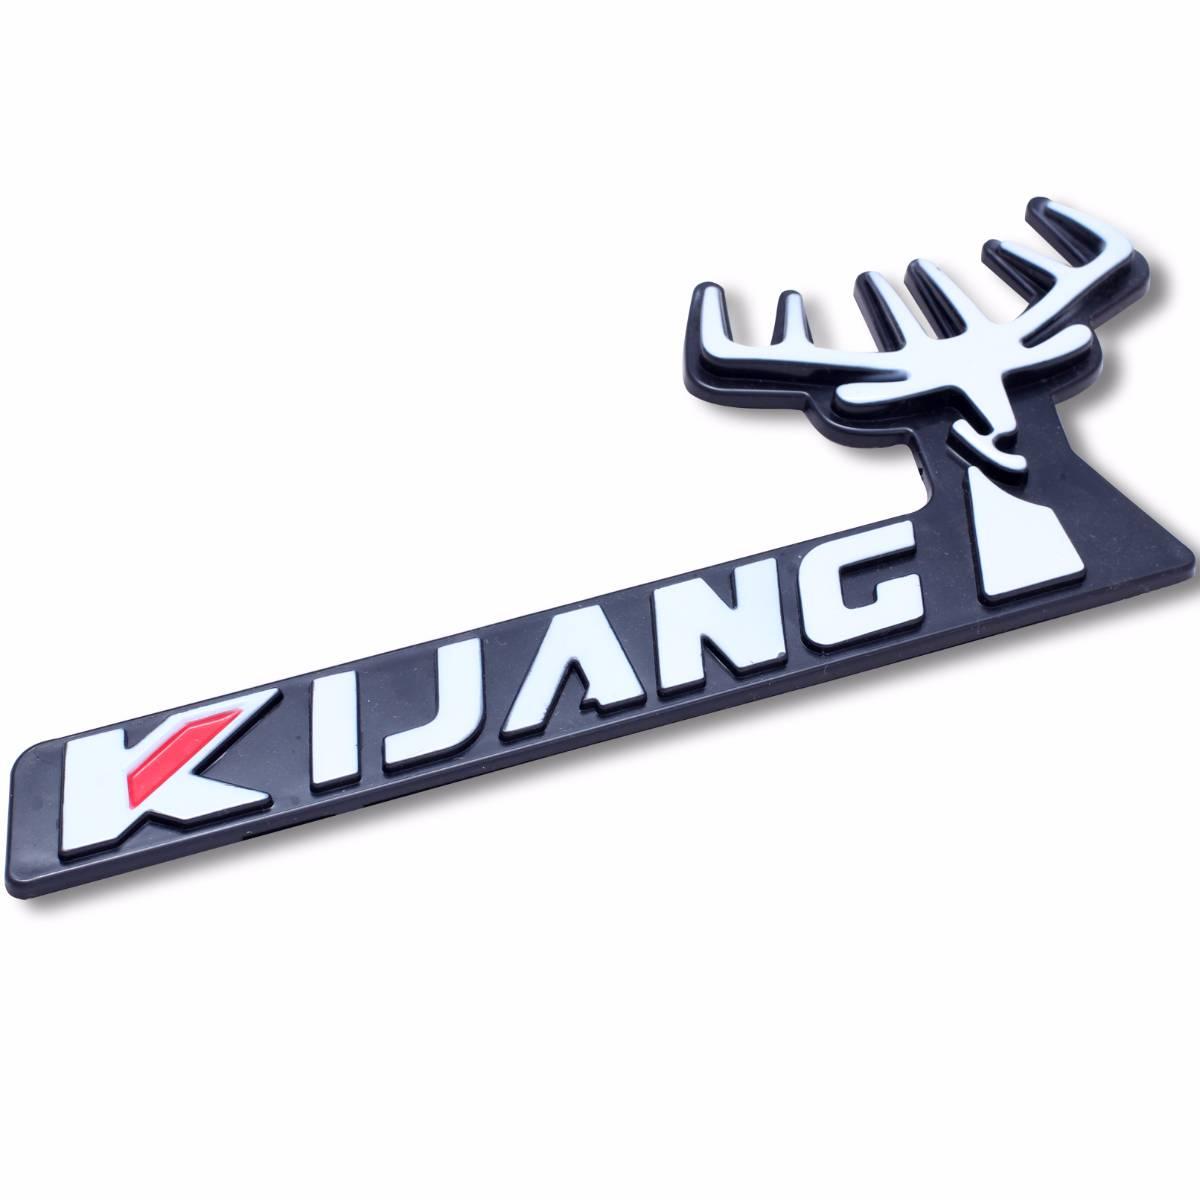 Emblem Logo Kijang - Main Logo